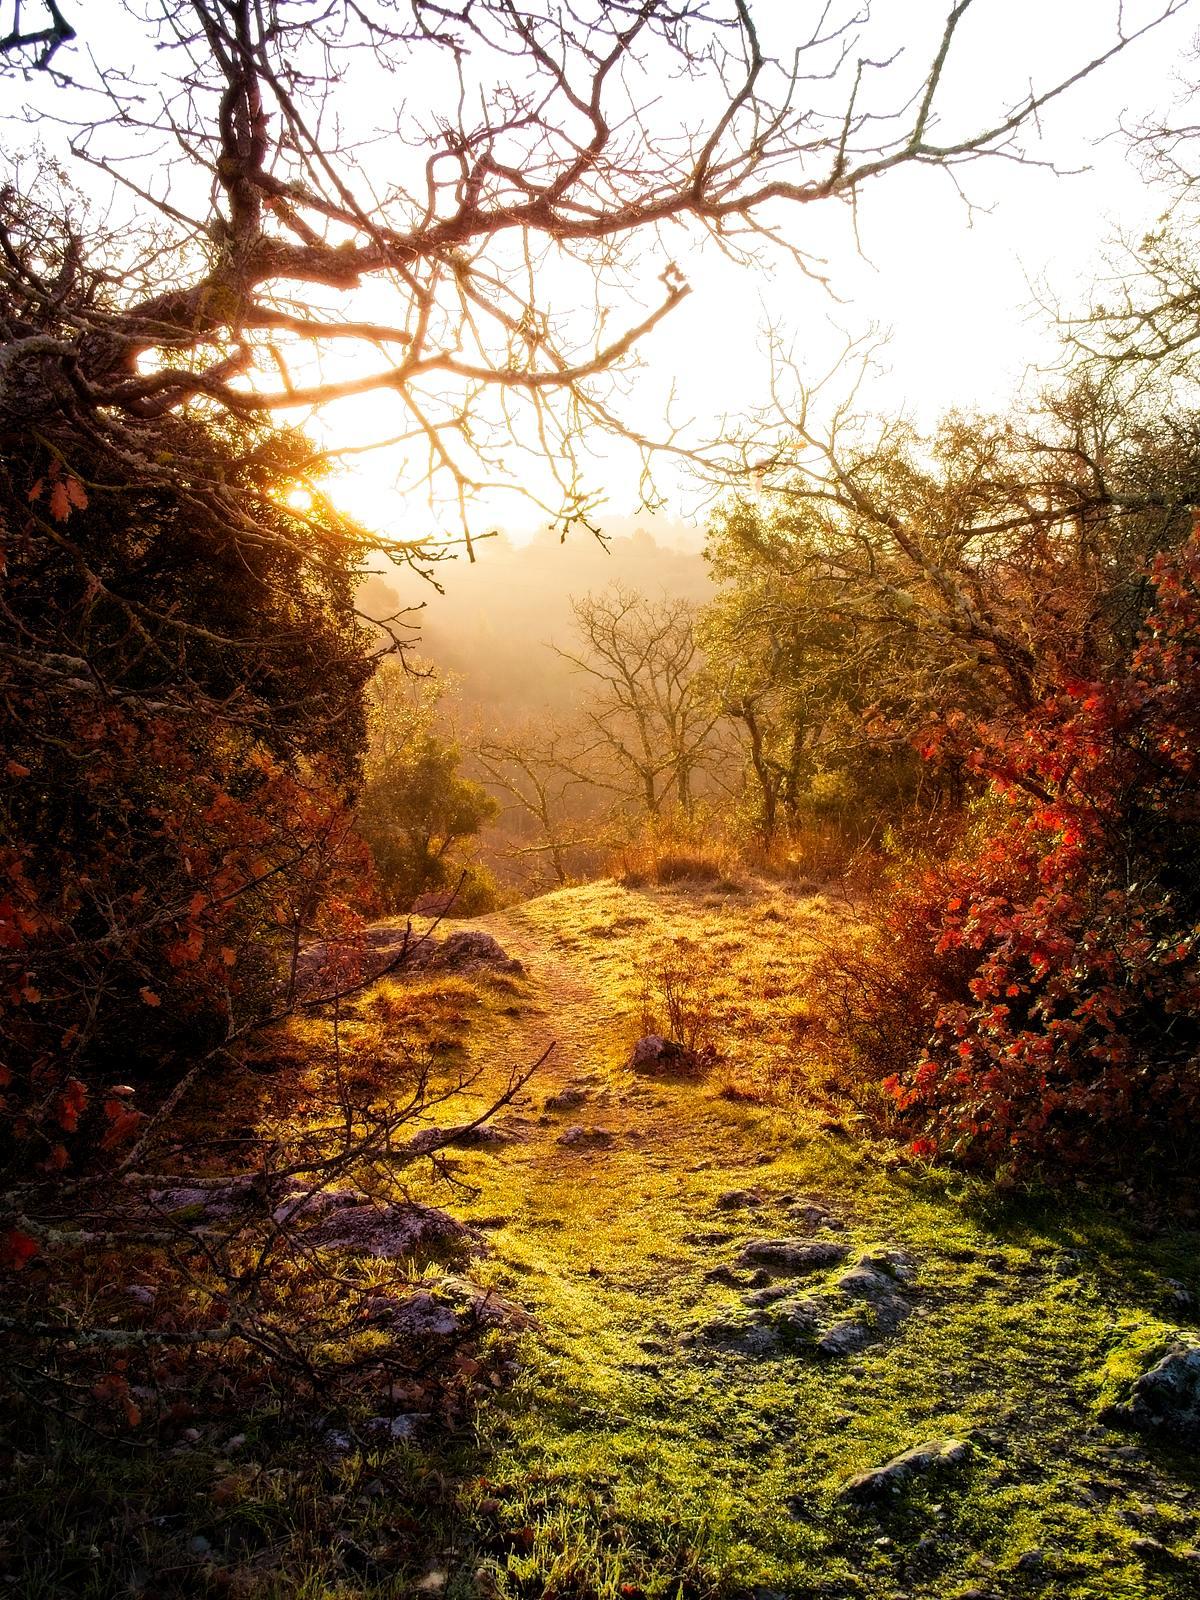 Morning sun in Vinon-sur-Verdon, Provence, France by Sam Davis Professional Landscape Photographer